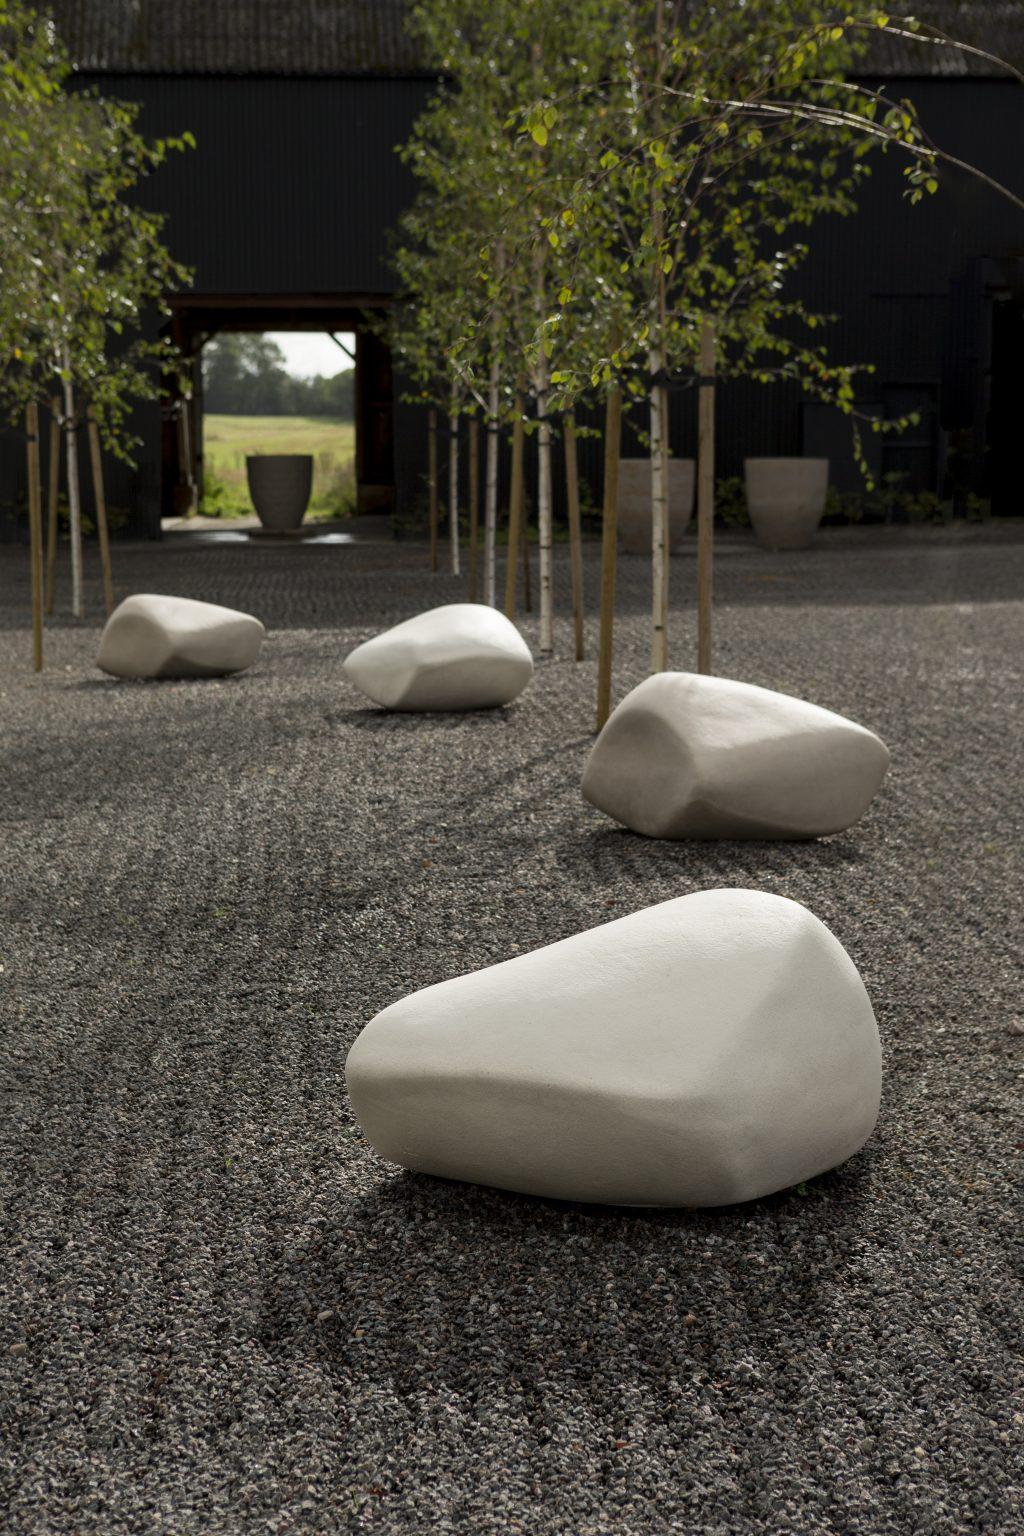 Biennale Interieur - Belgium's leading design and interior event - Vierkant_zweden2019-2288-1.jpg